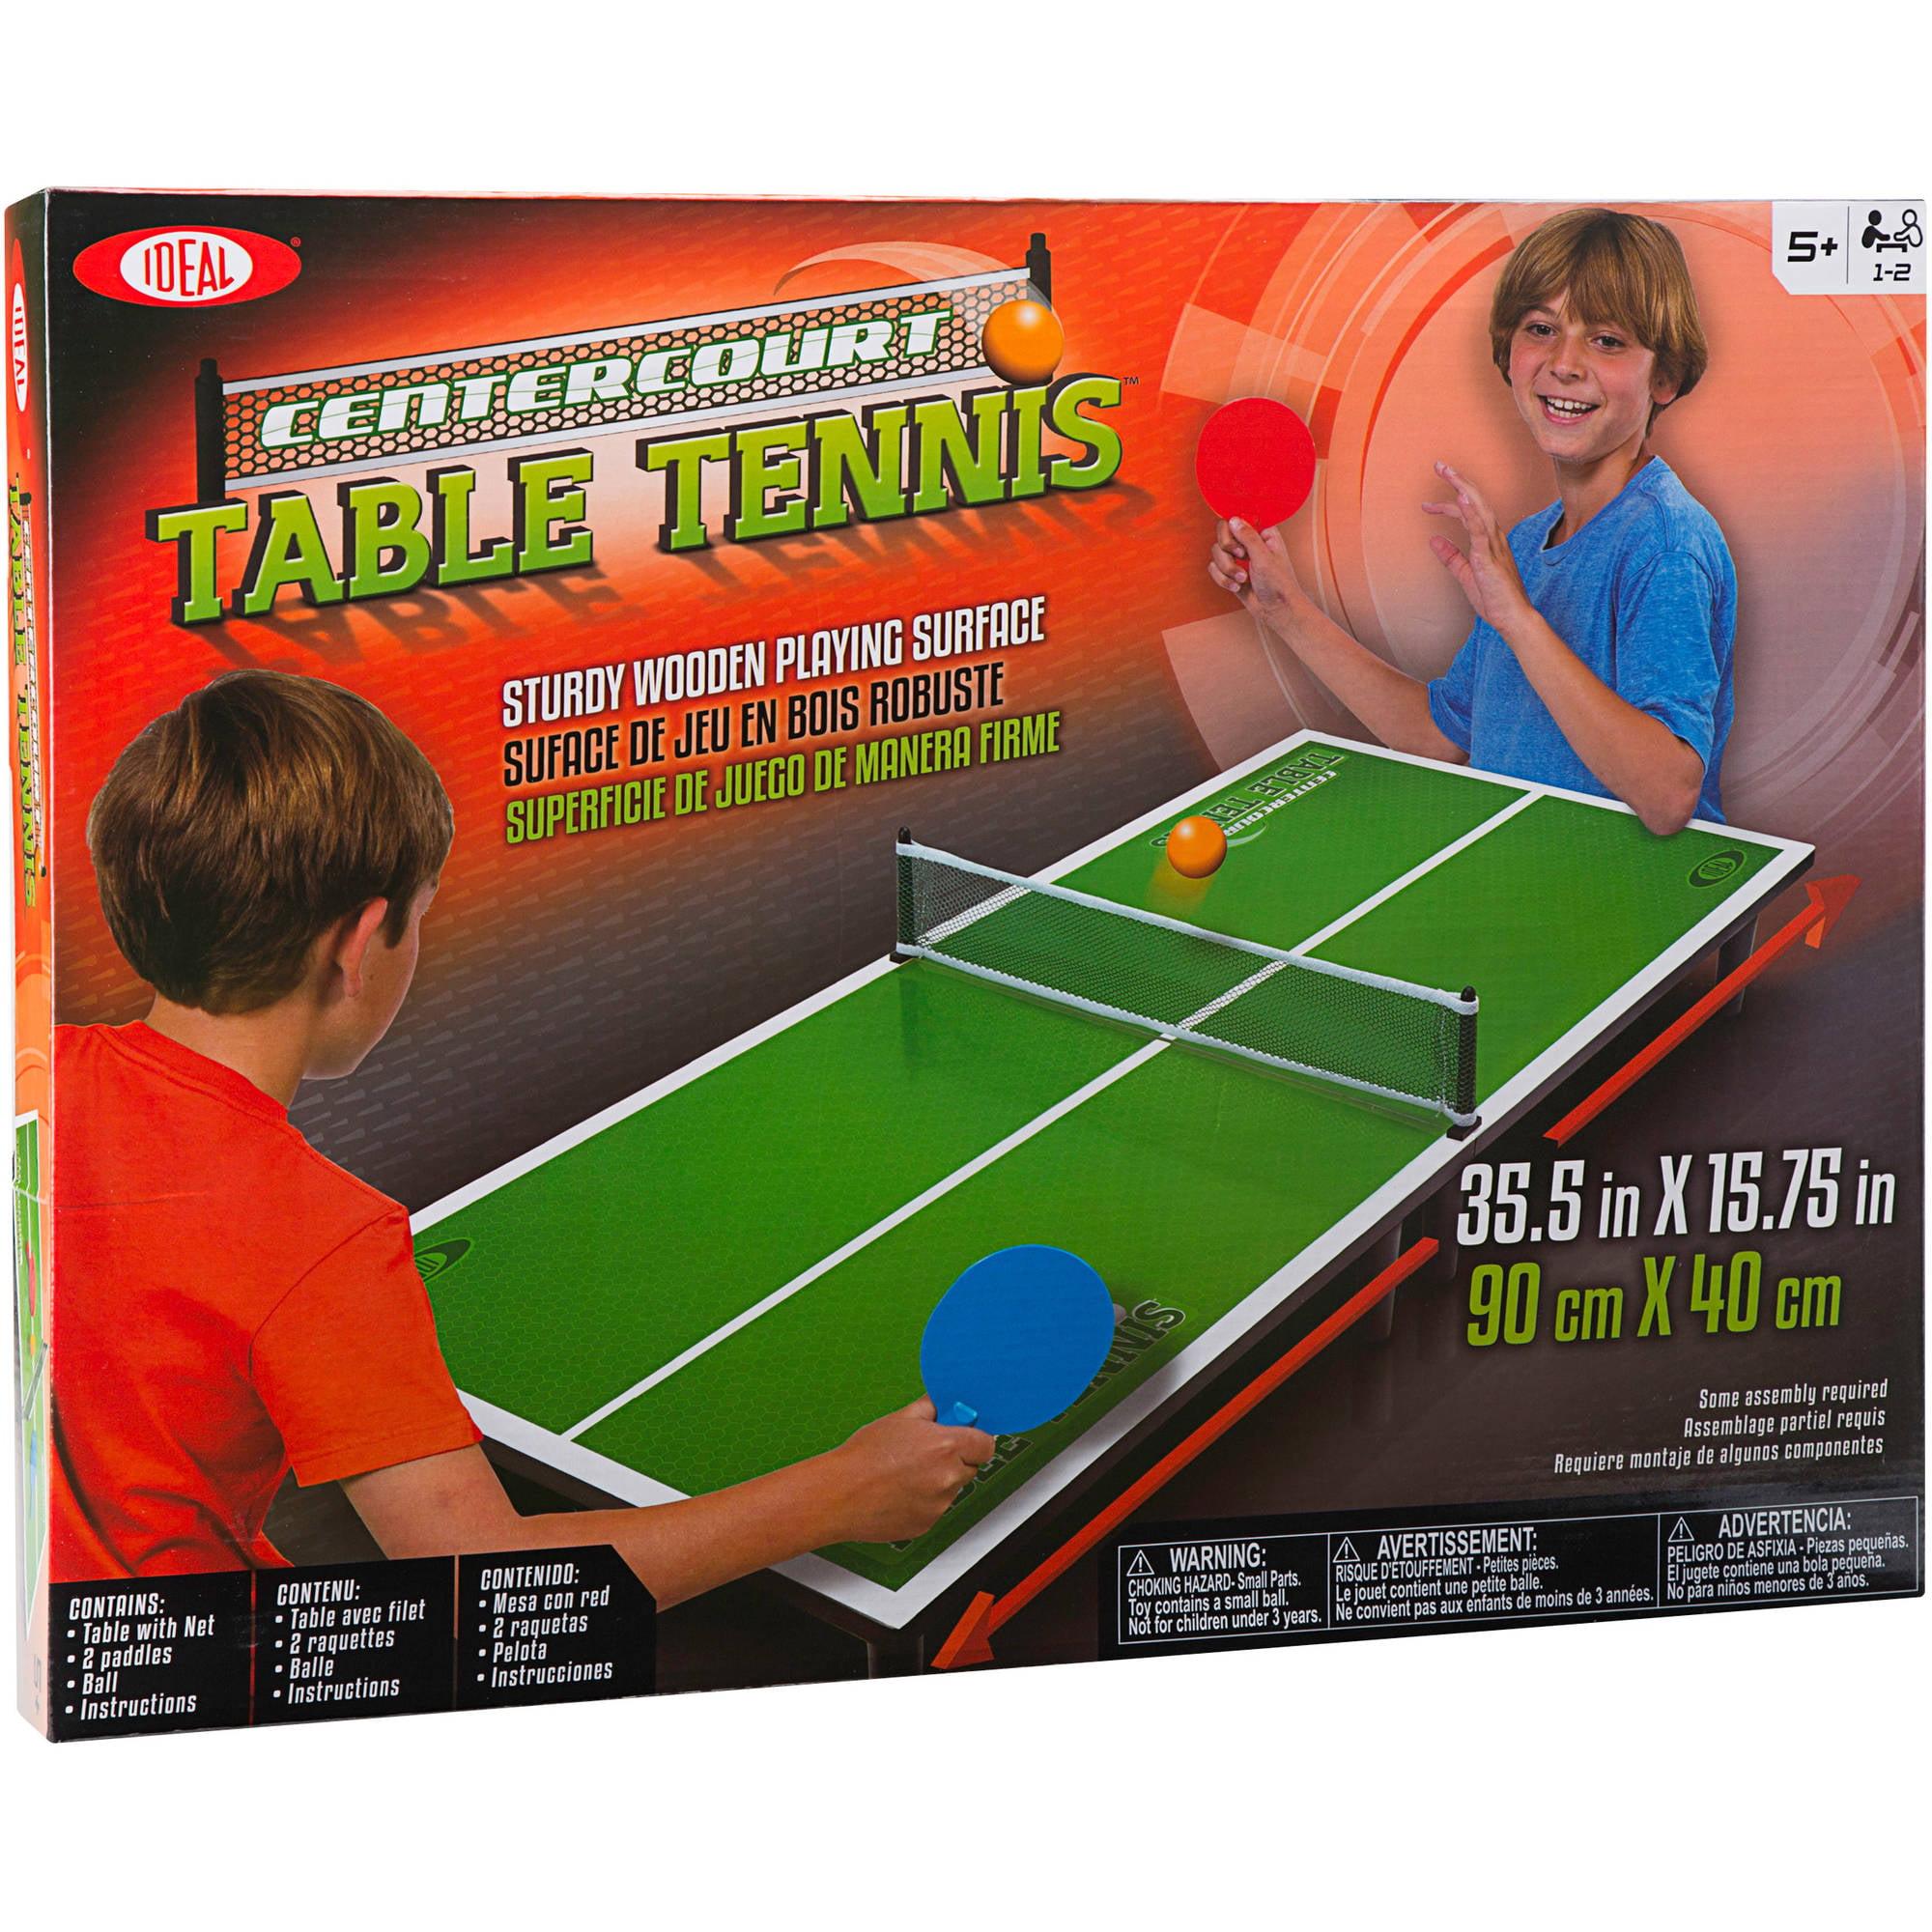 Ideal Centercourt Ping Pong by Alex Brands